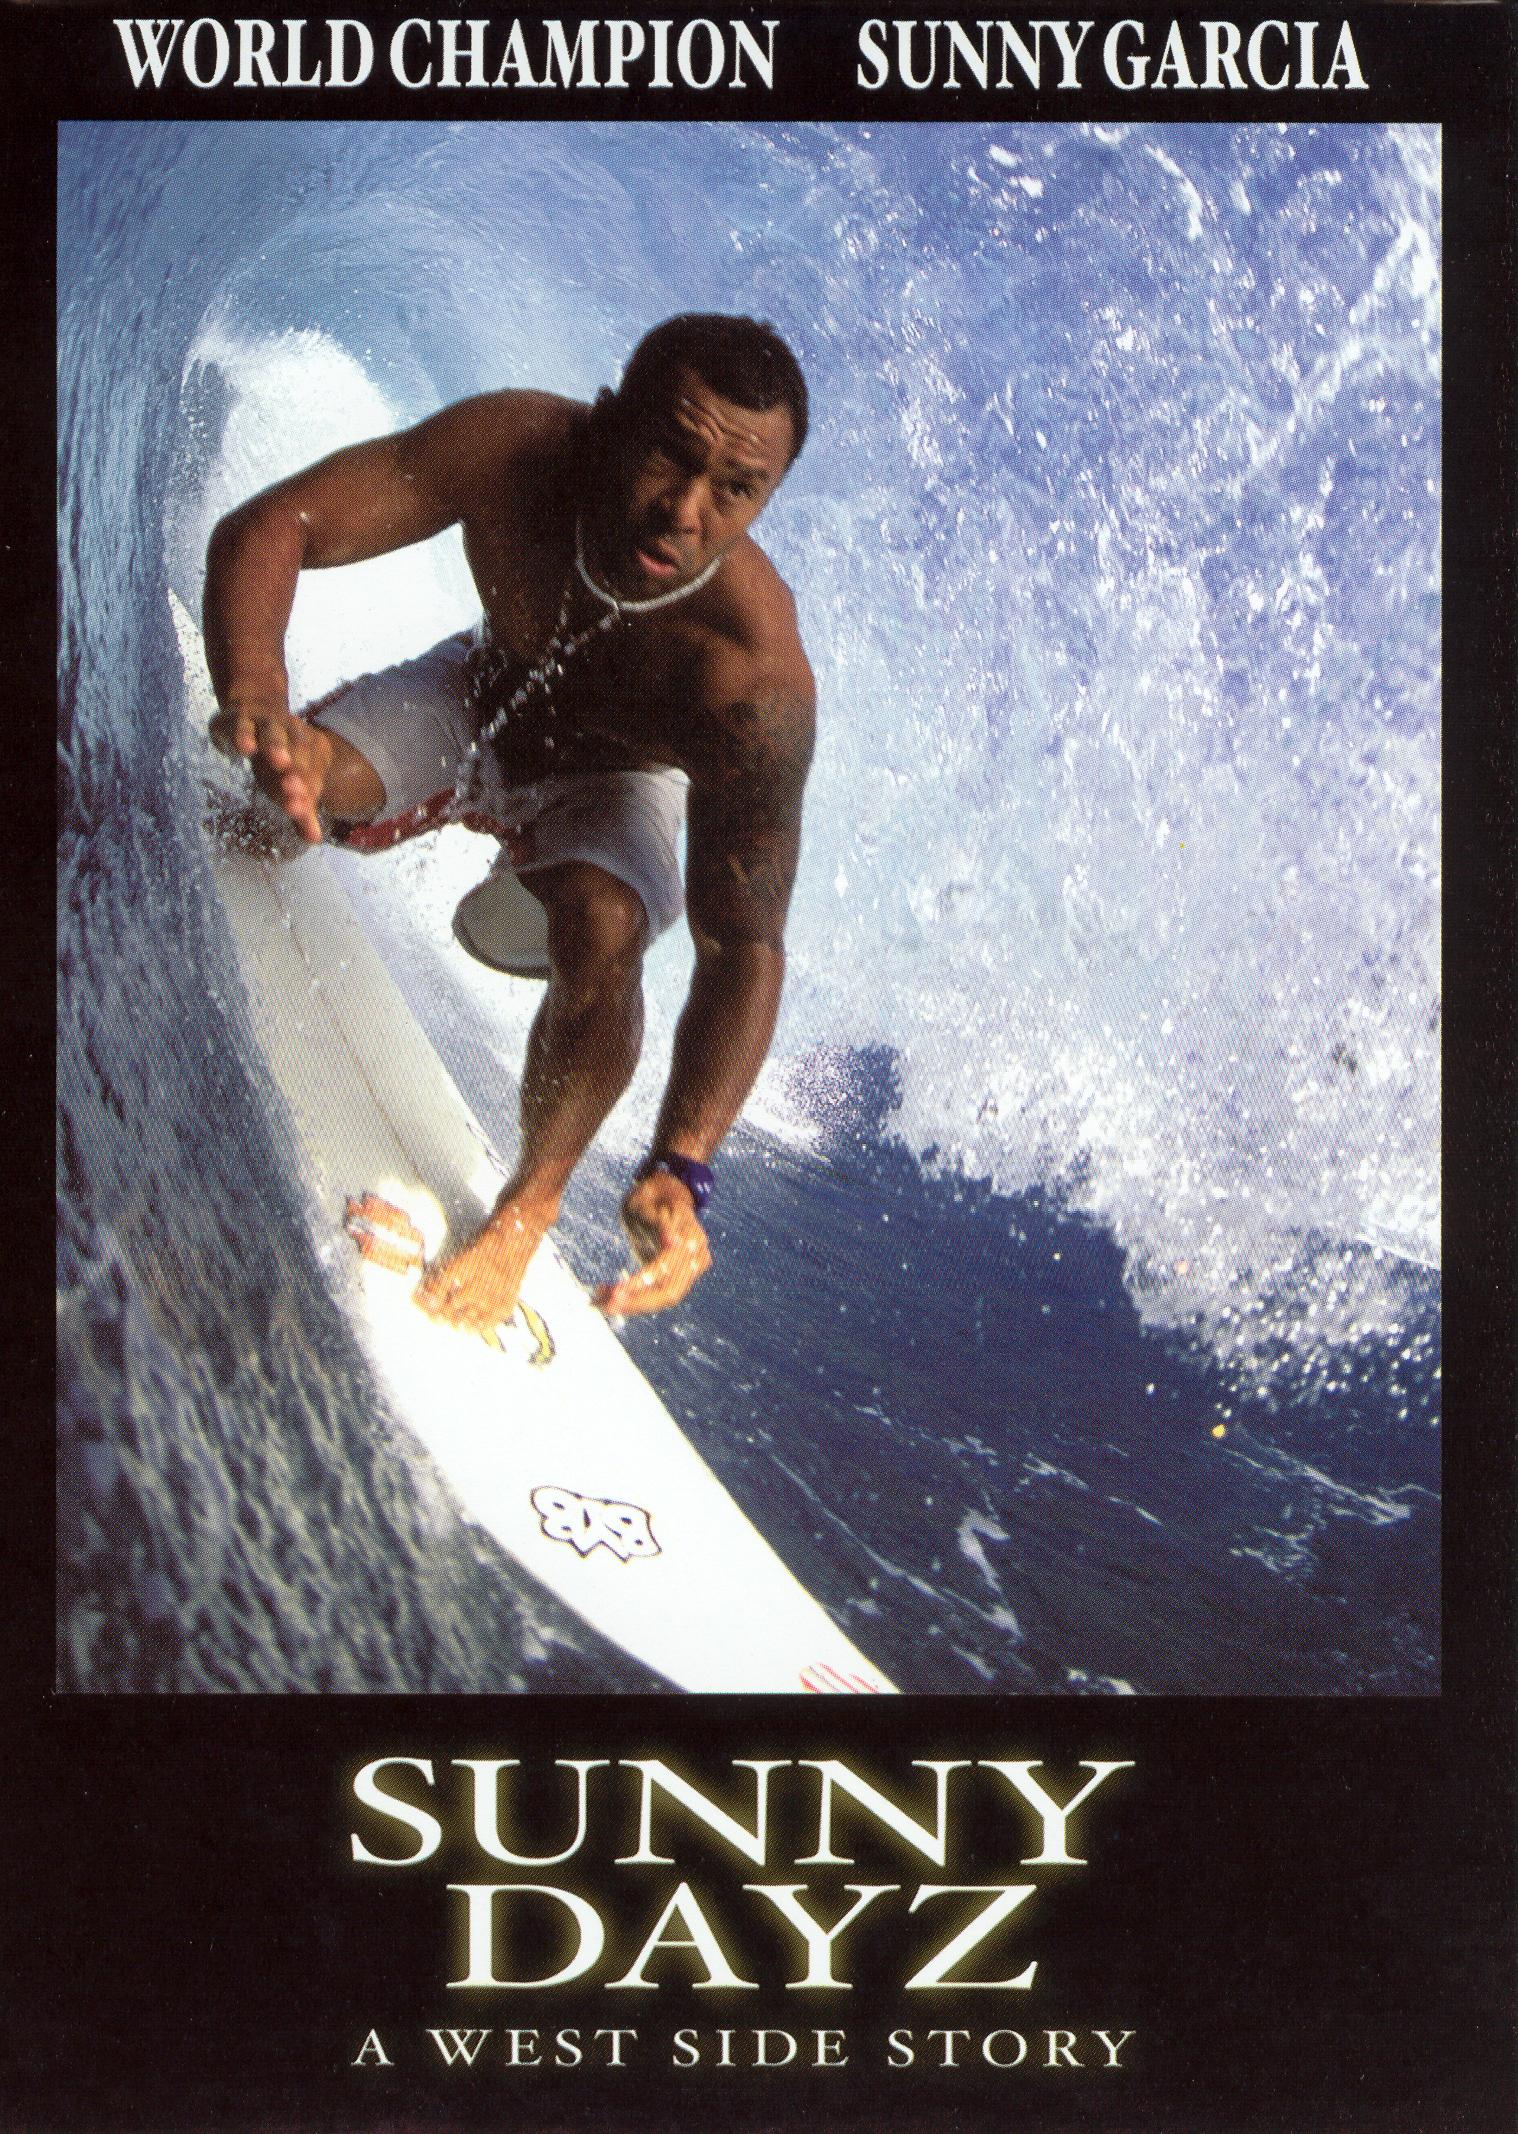 Sunny Garcia: Sunny Dayz - A West Side Story